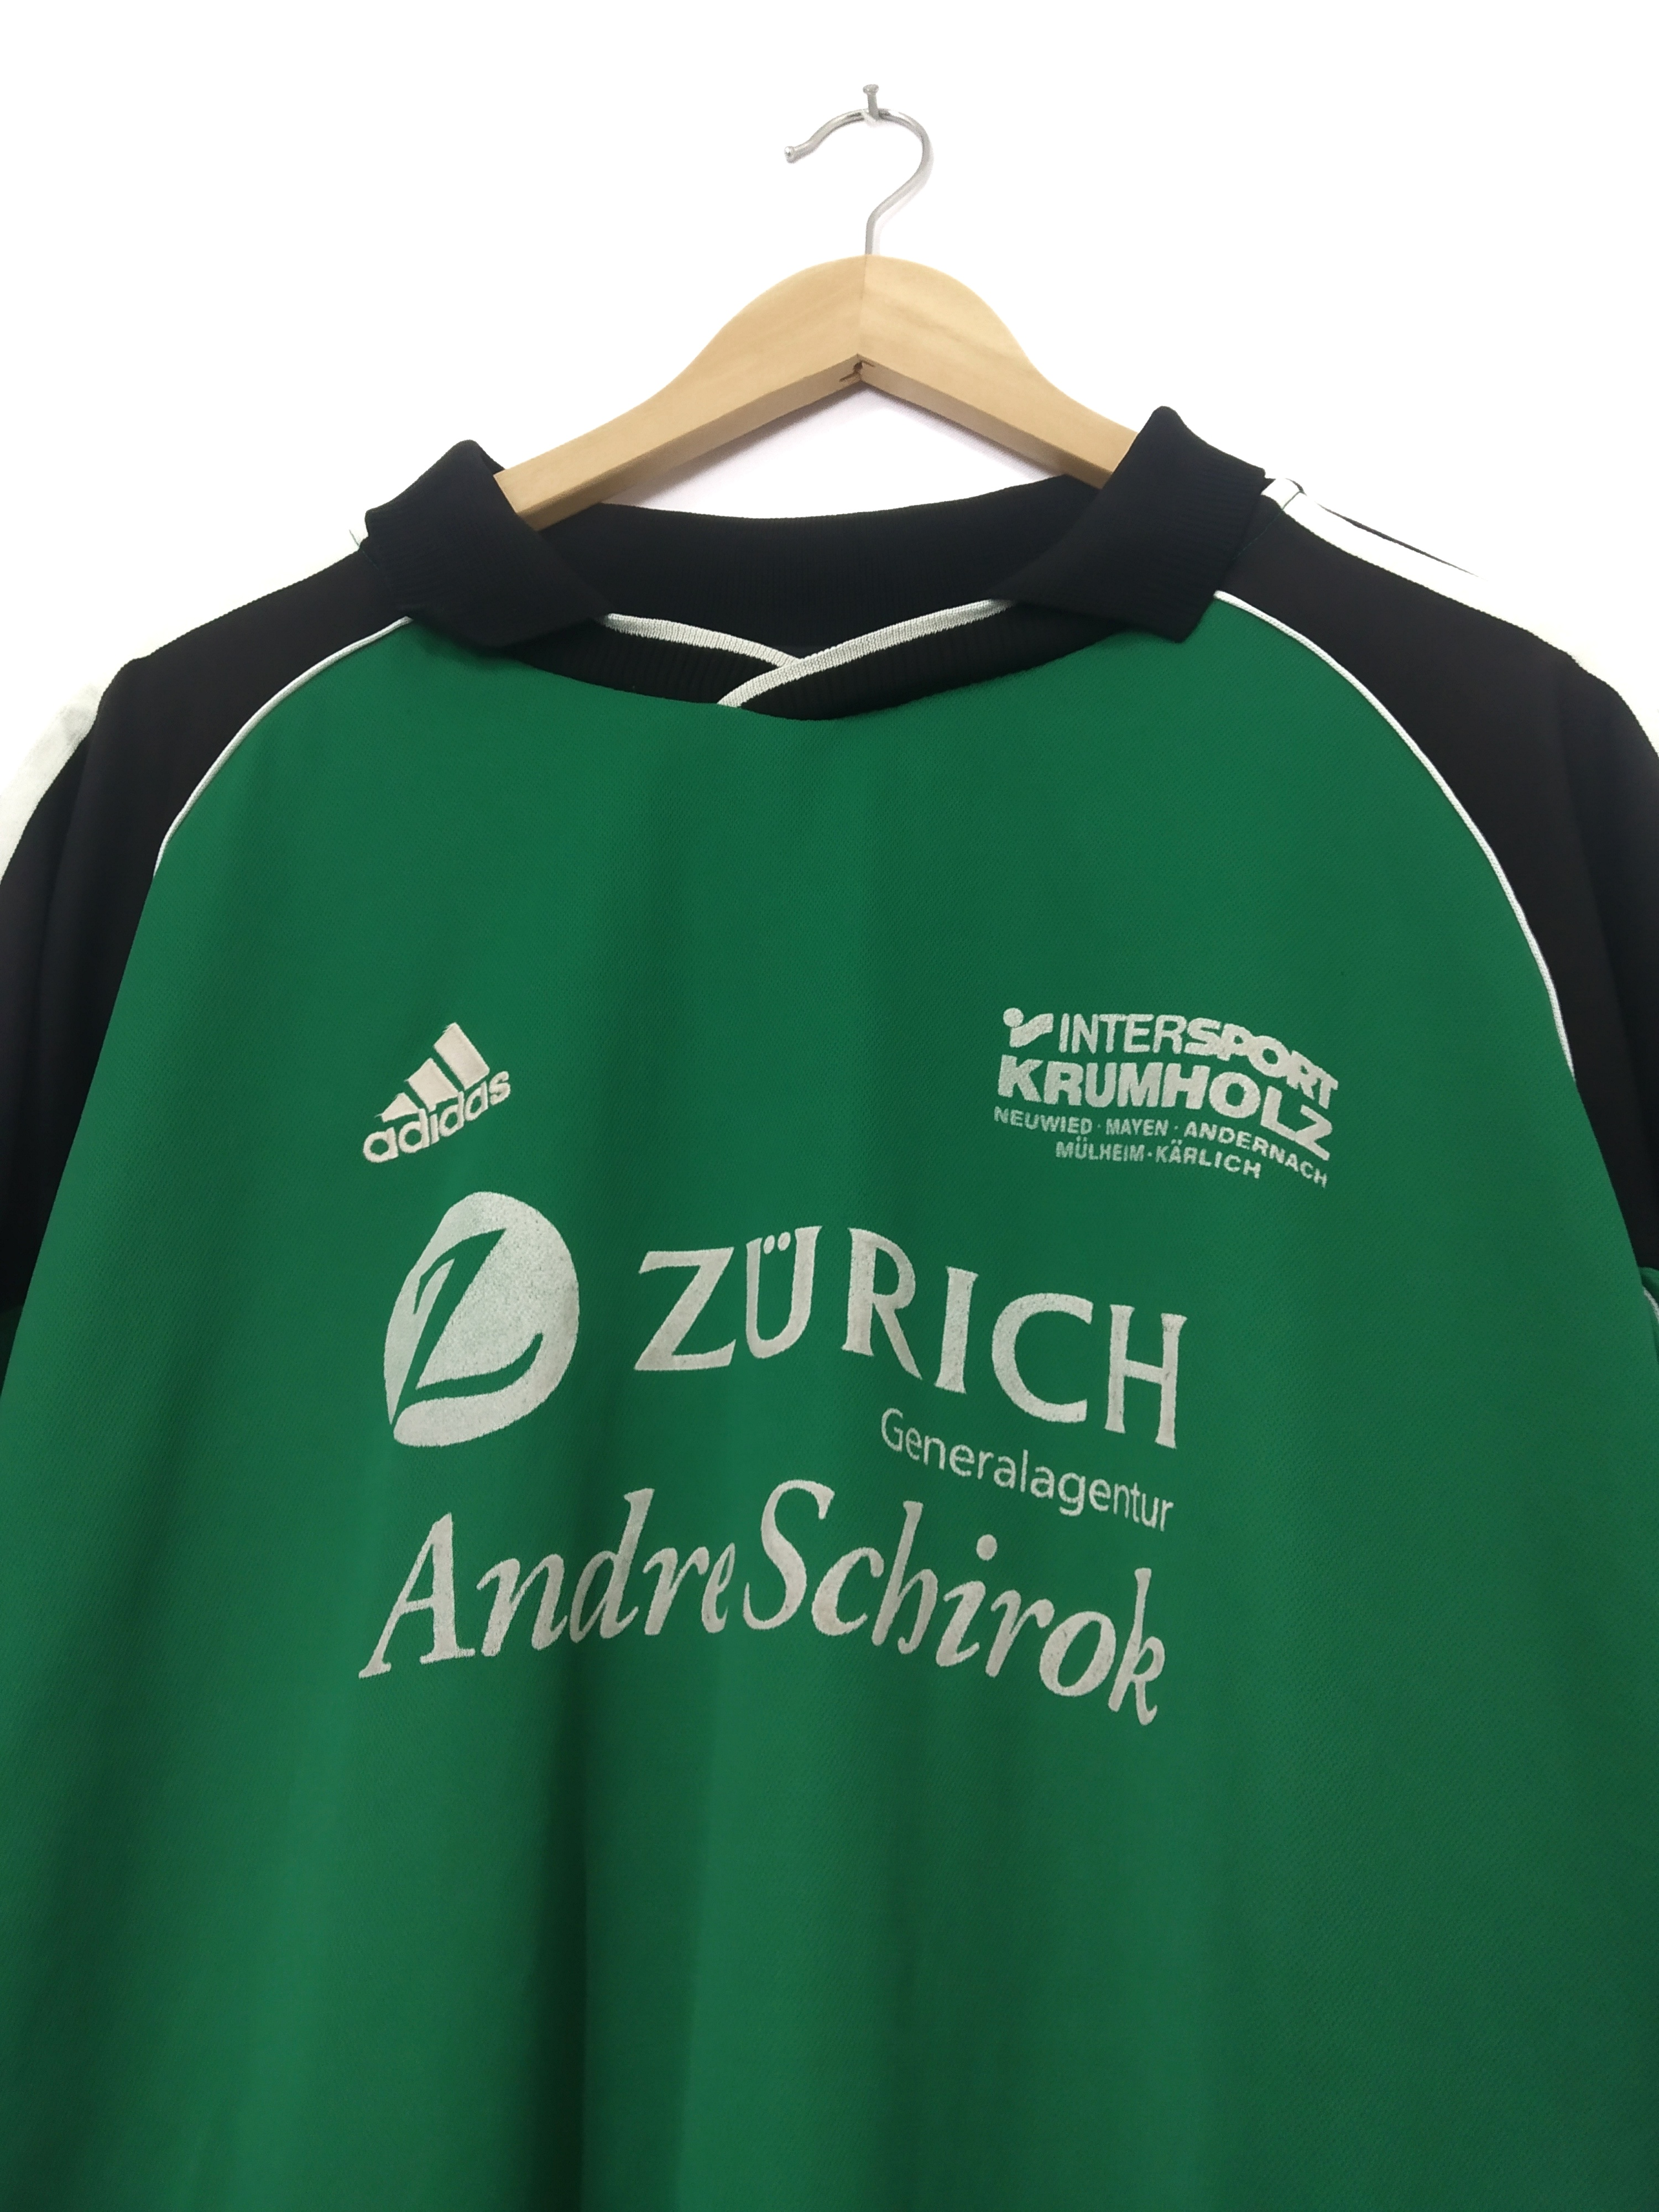 Retro Adidas Intersport Krumholz Football Shirt